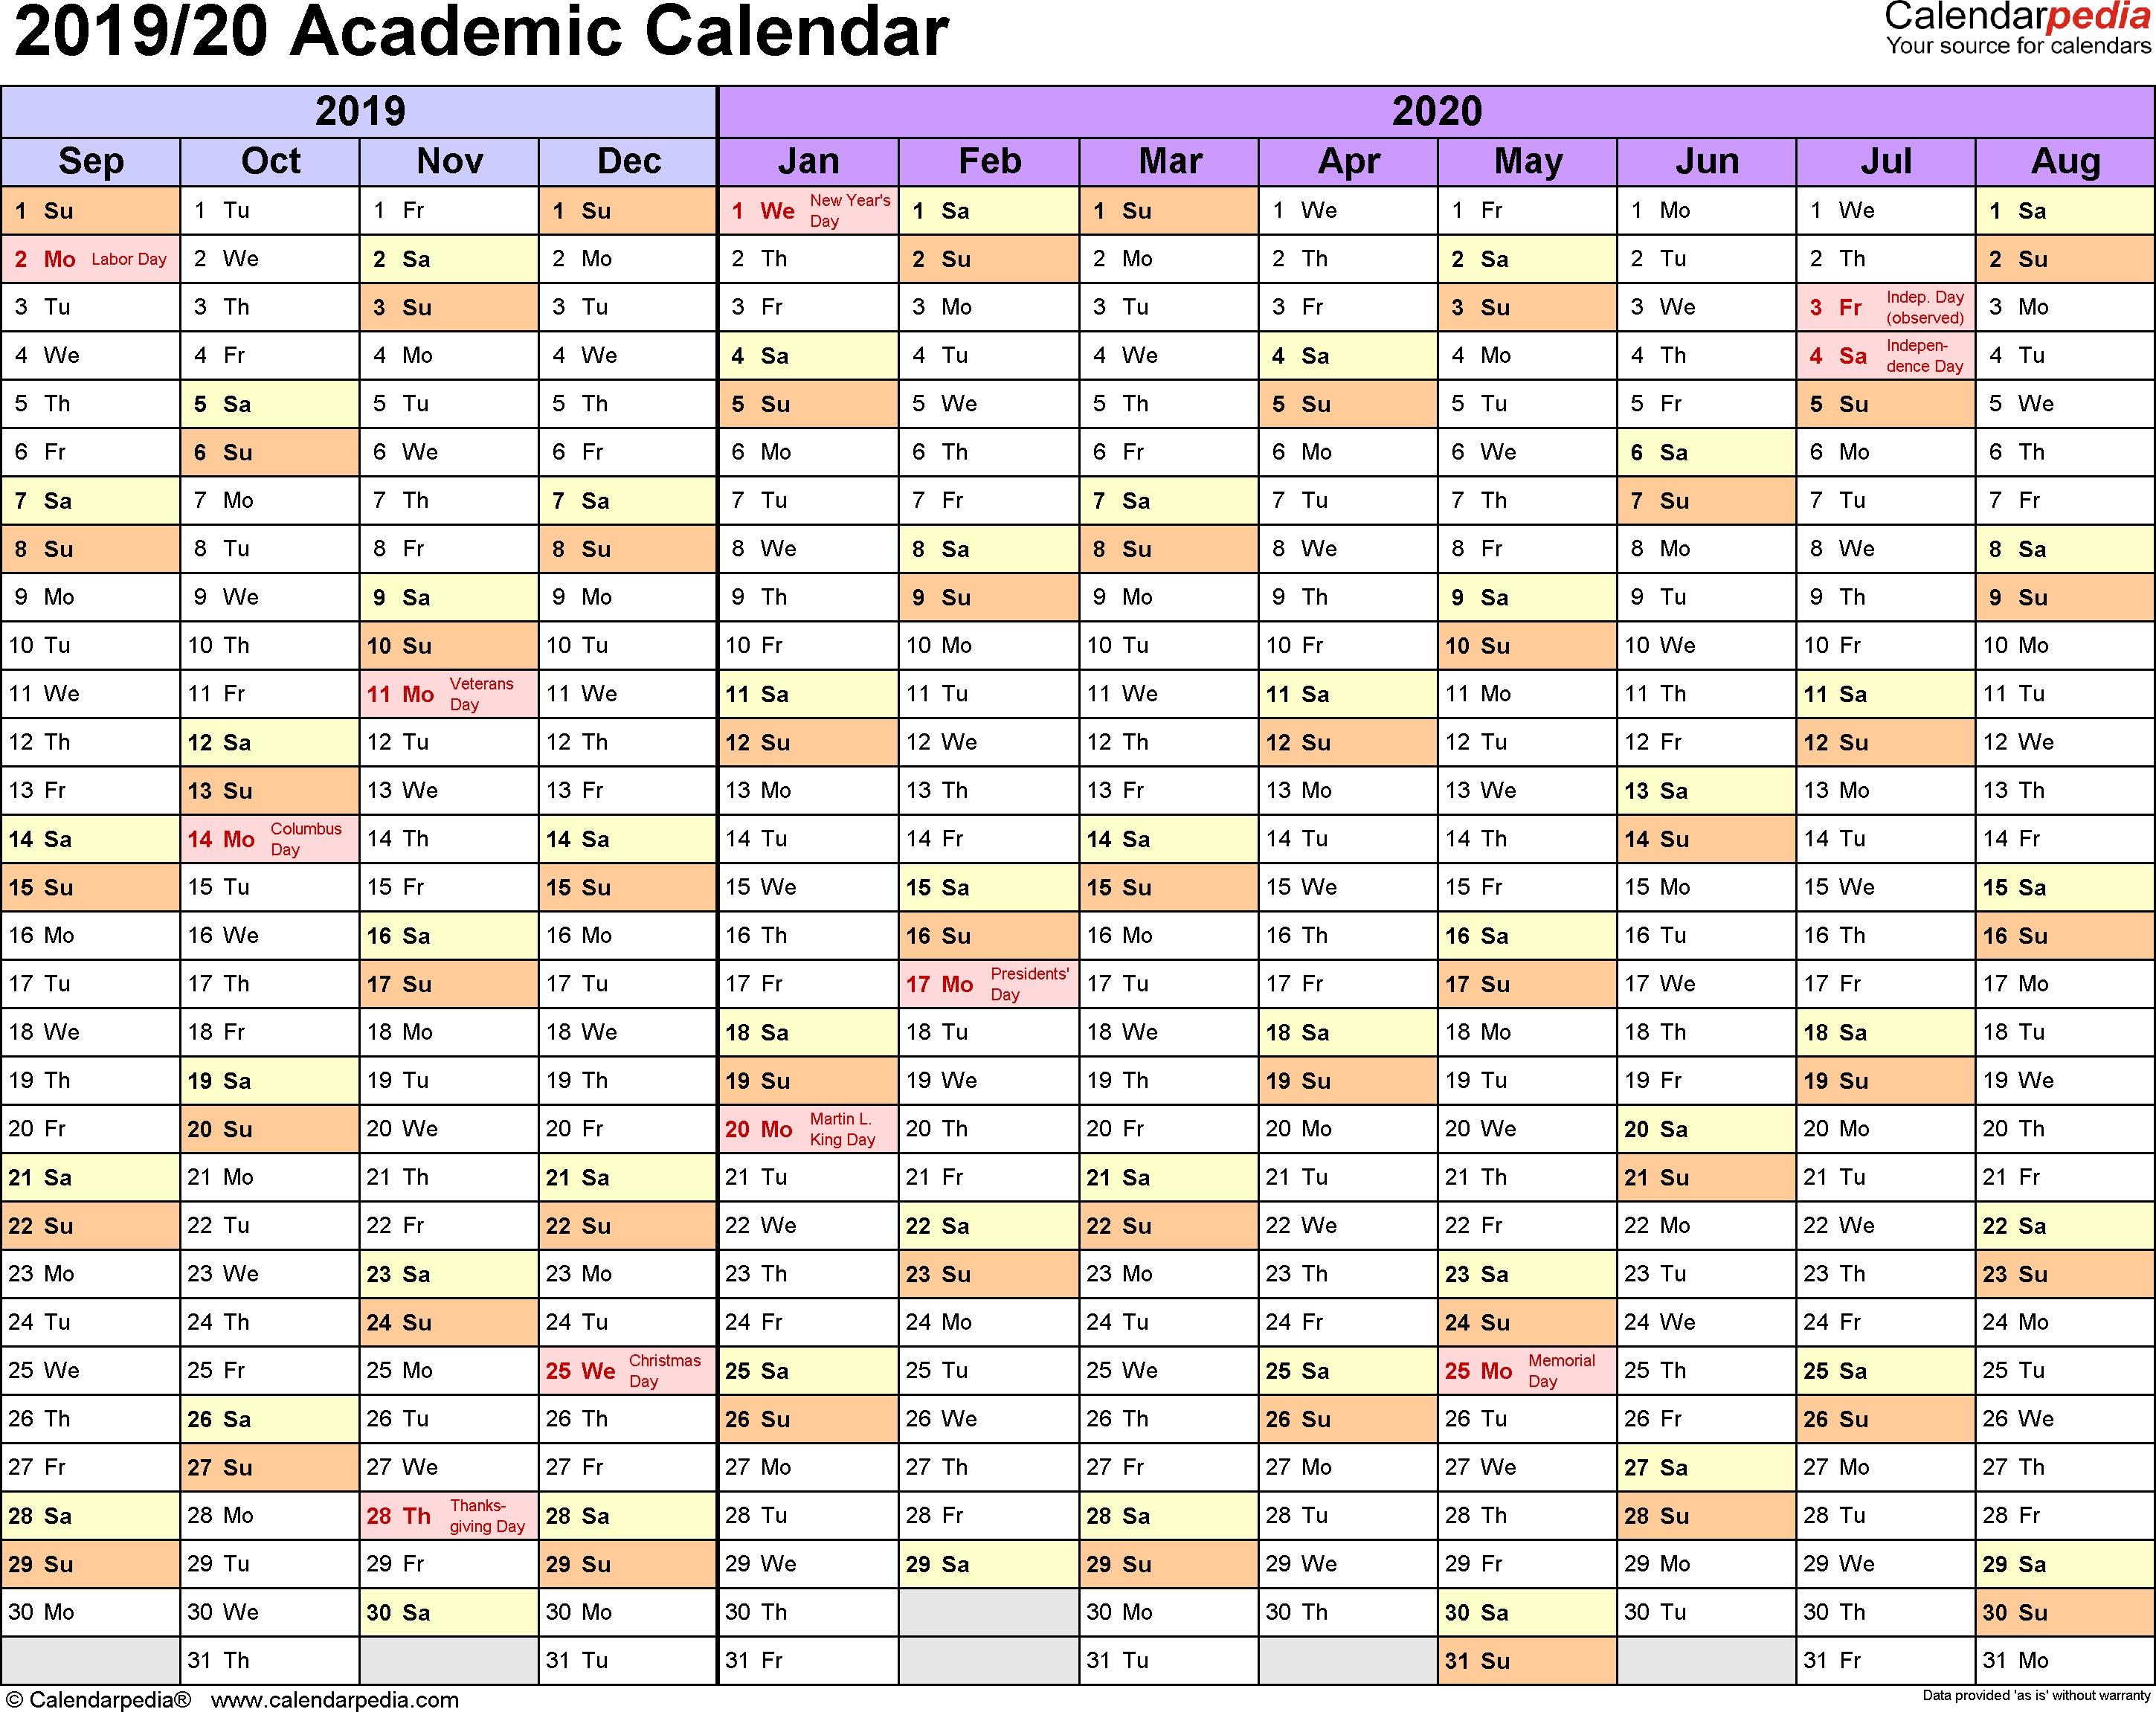 Academic Calendars 2019/2020 - Free Printable Excel Templates inside 2019-2020 Quarterly Calendar